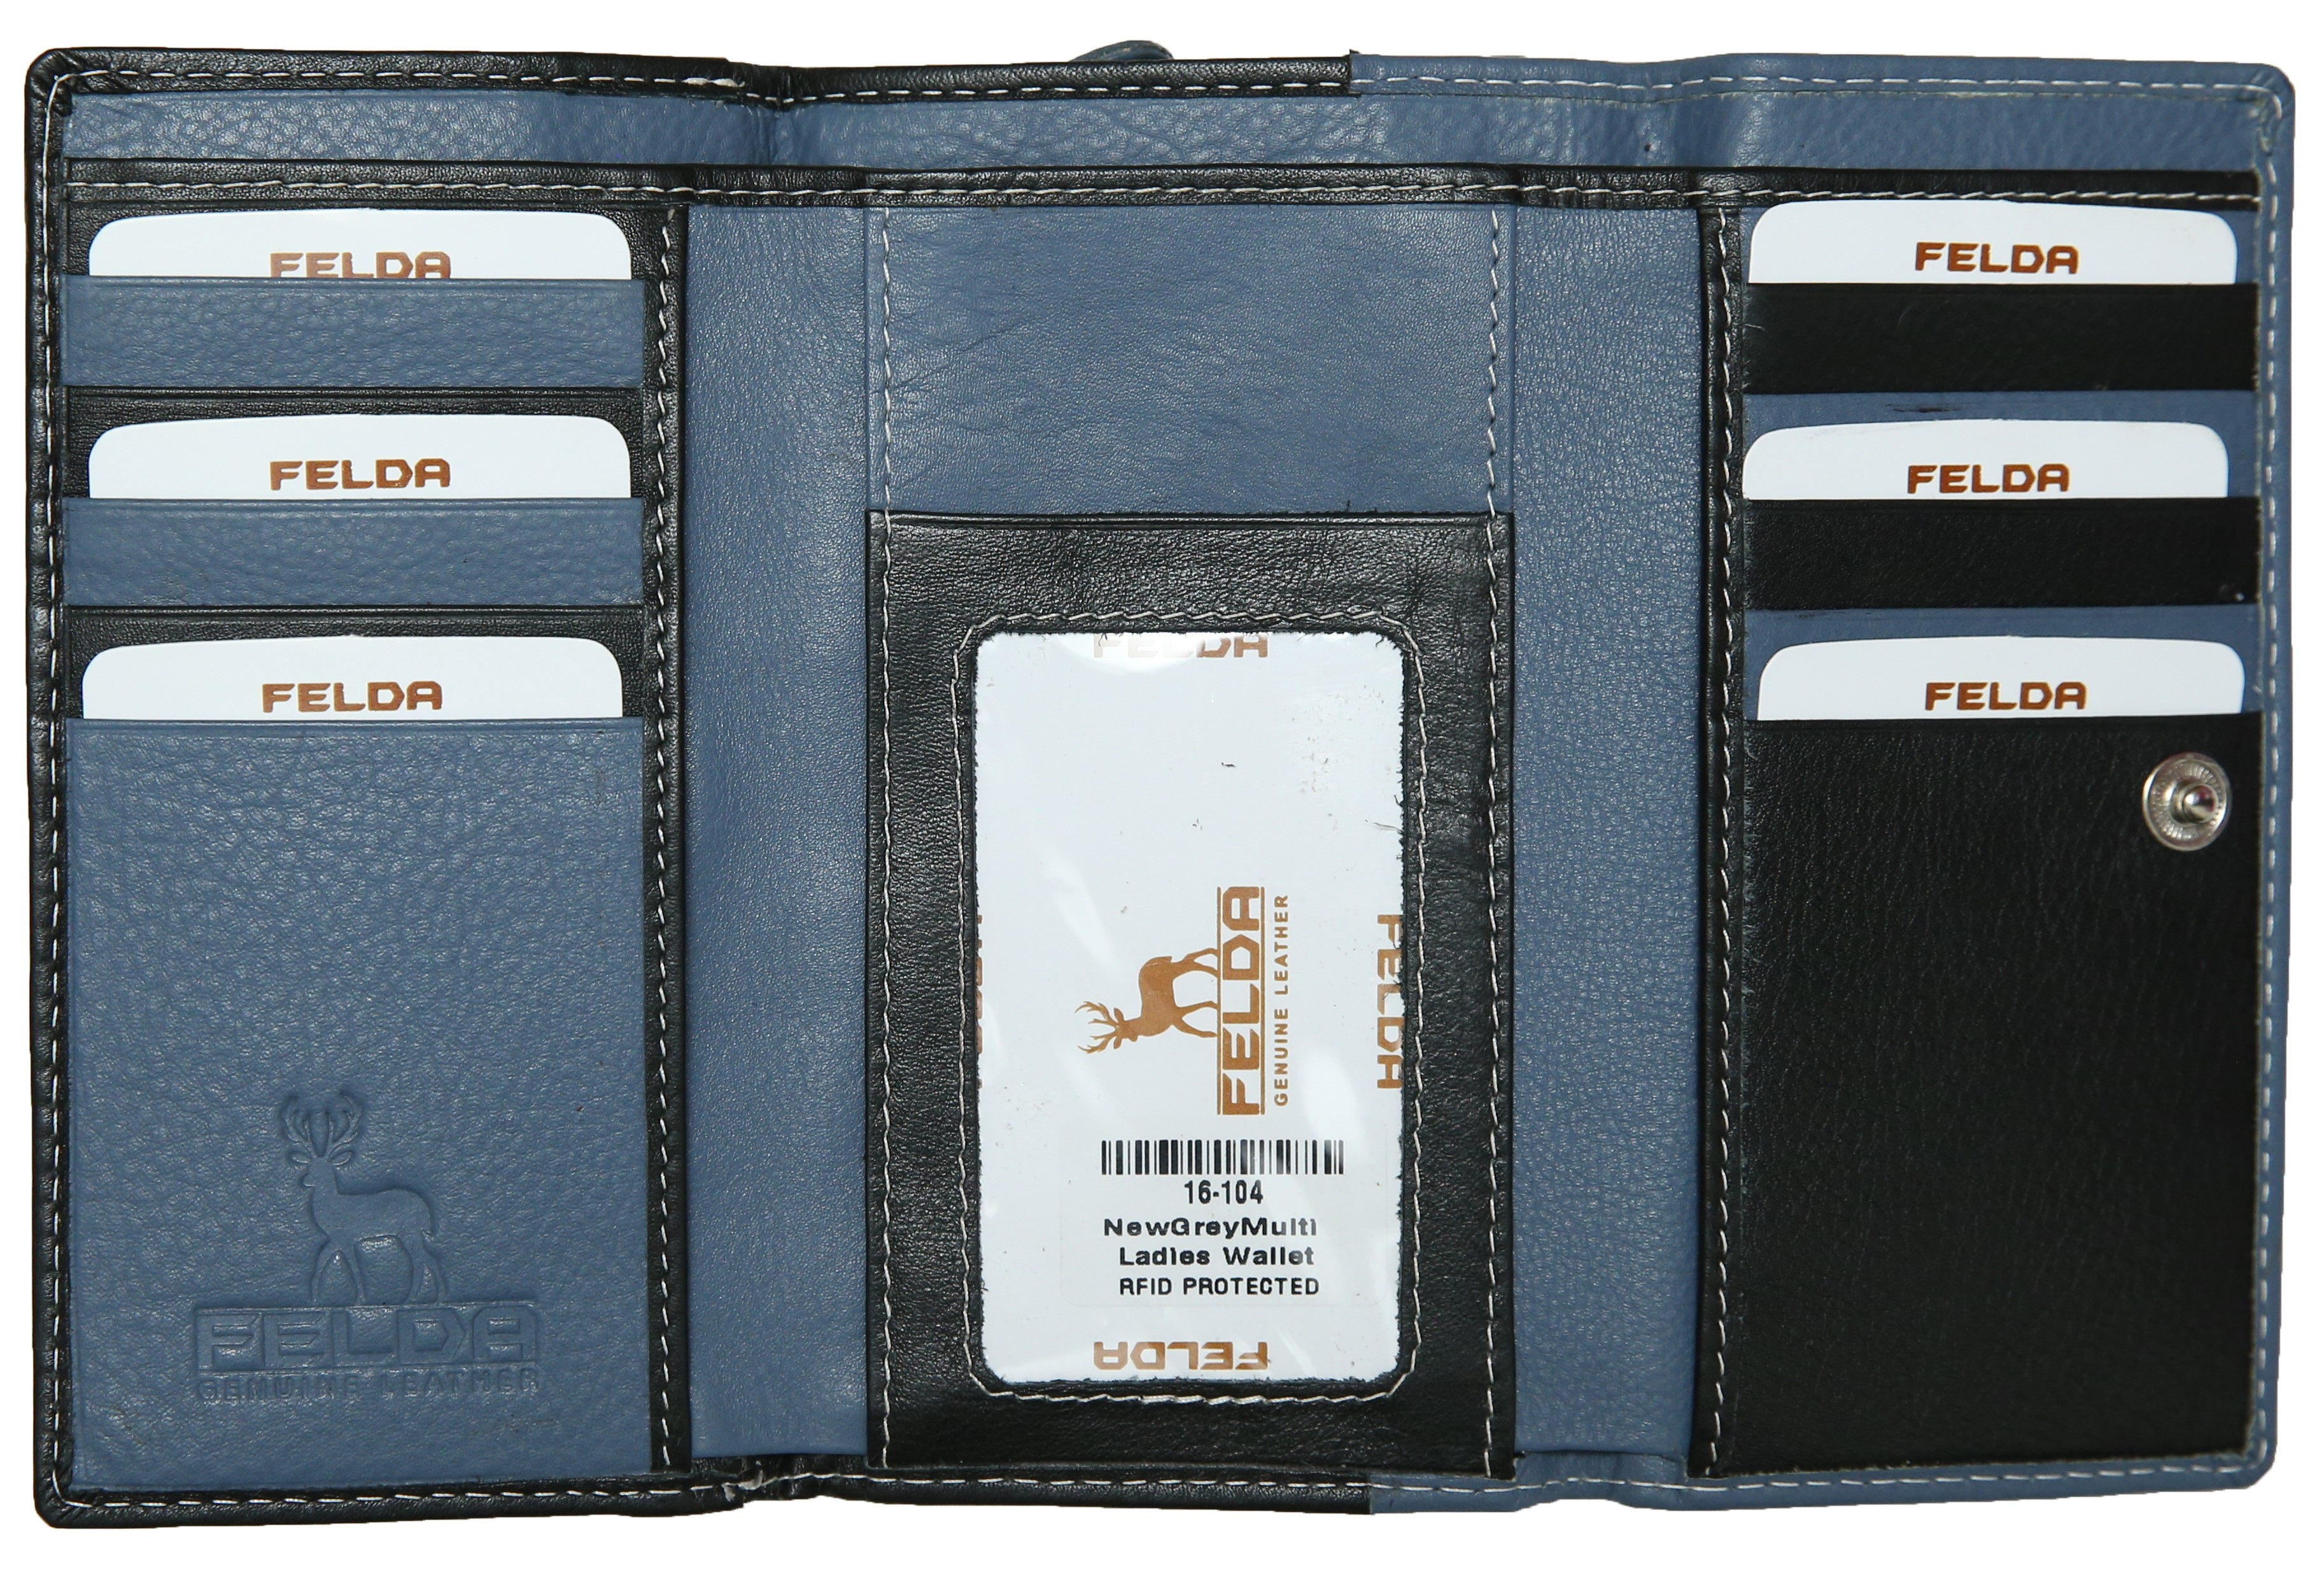 Felda-Portefeuille-pour-cartes-de-credit-cuir-souple-plusieurs-coloris miniature 30